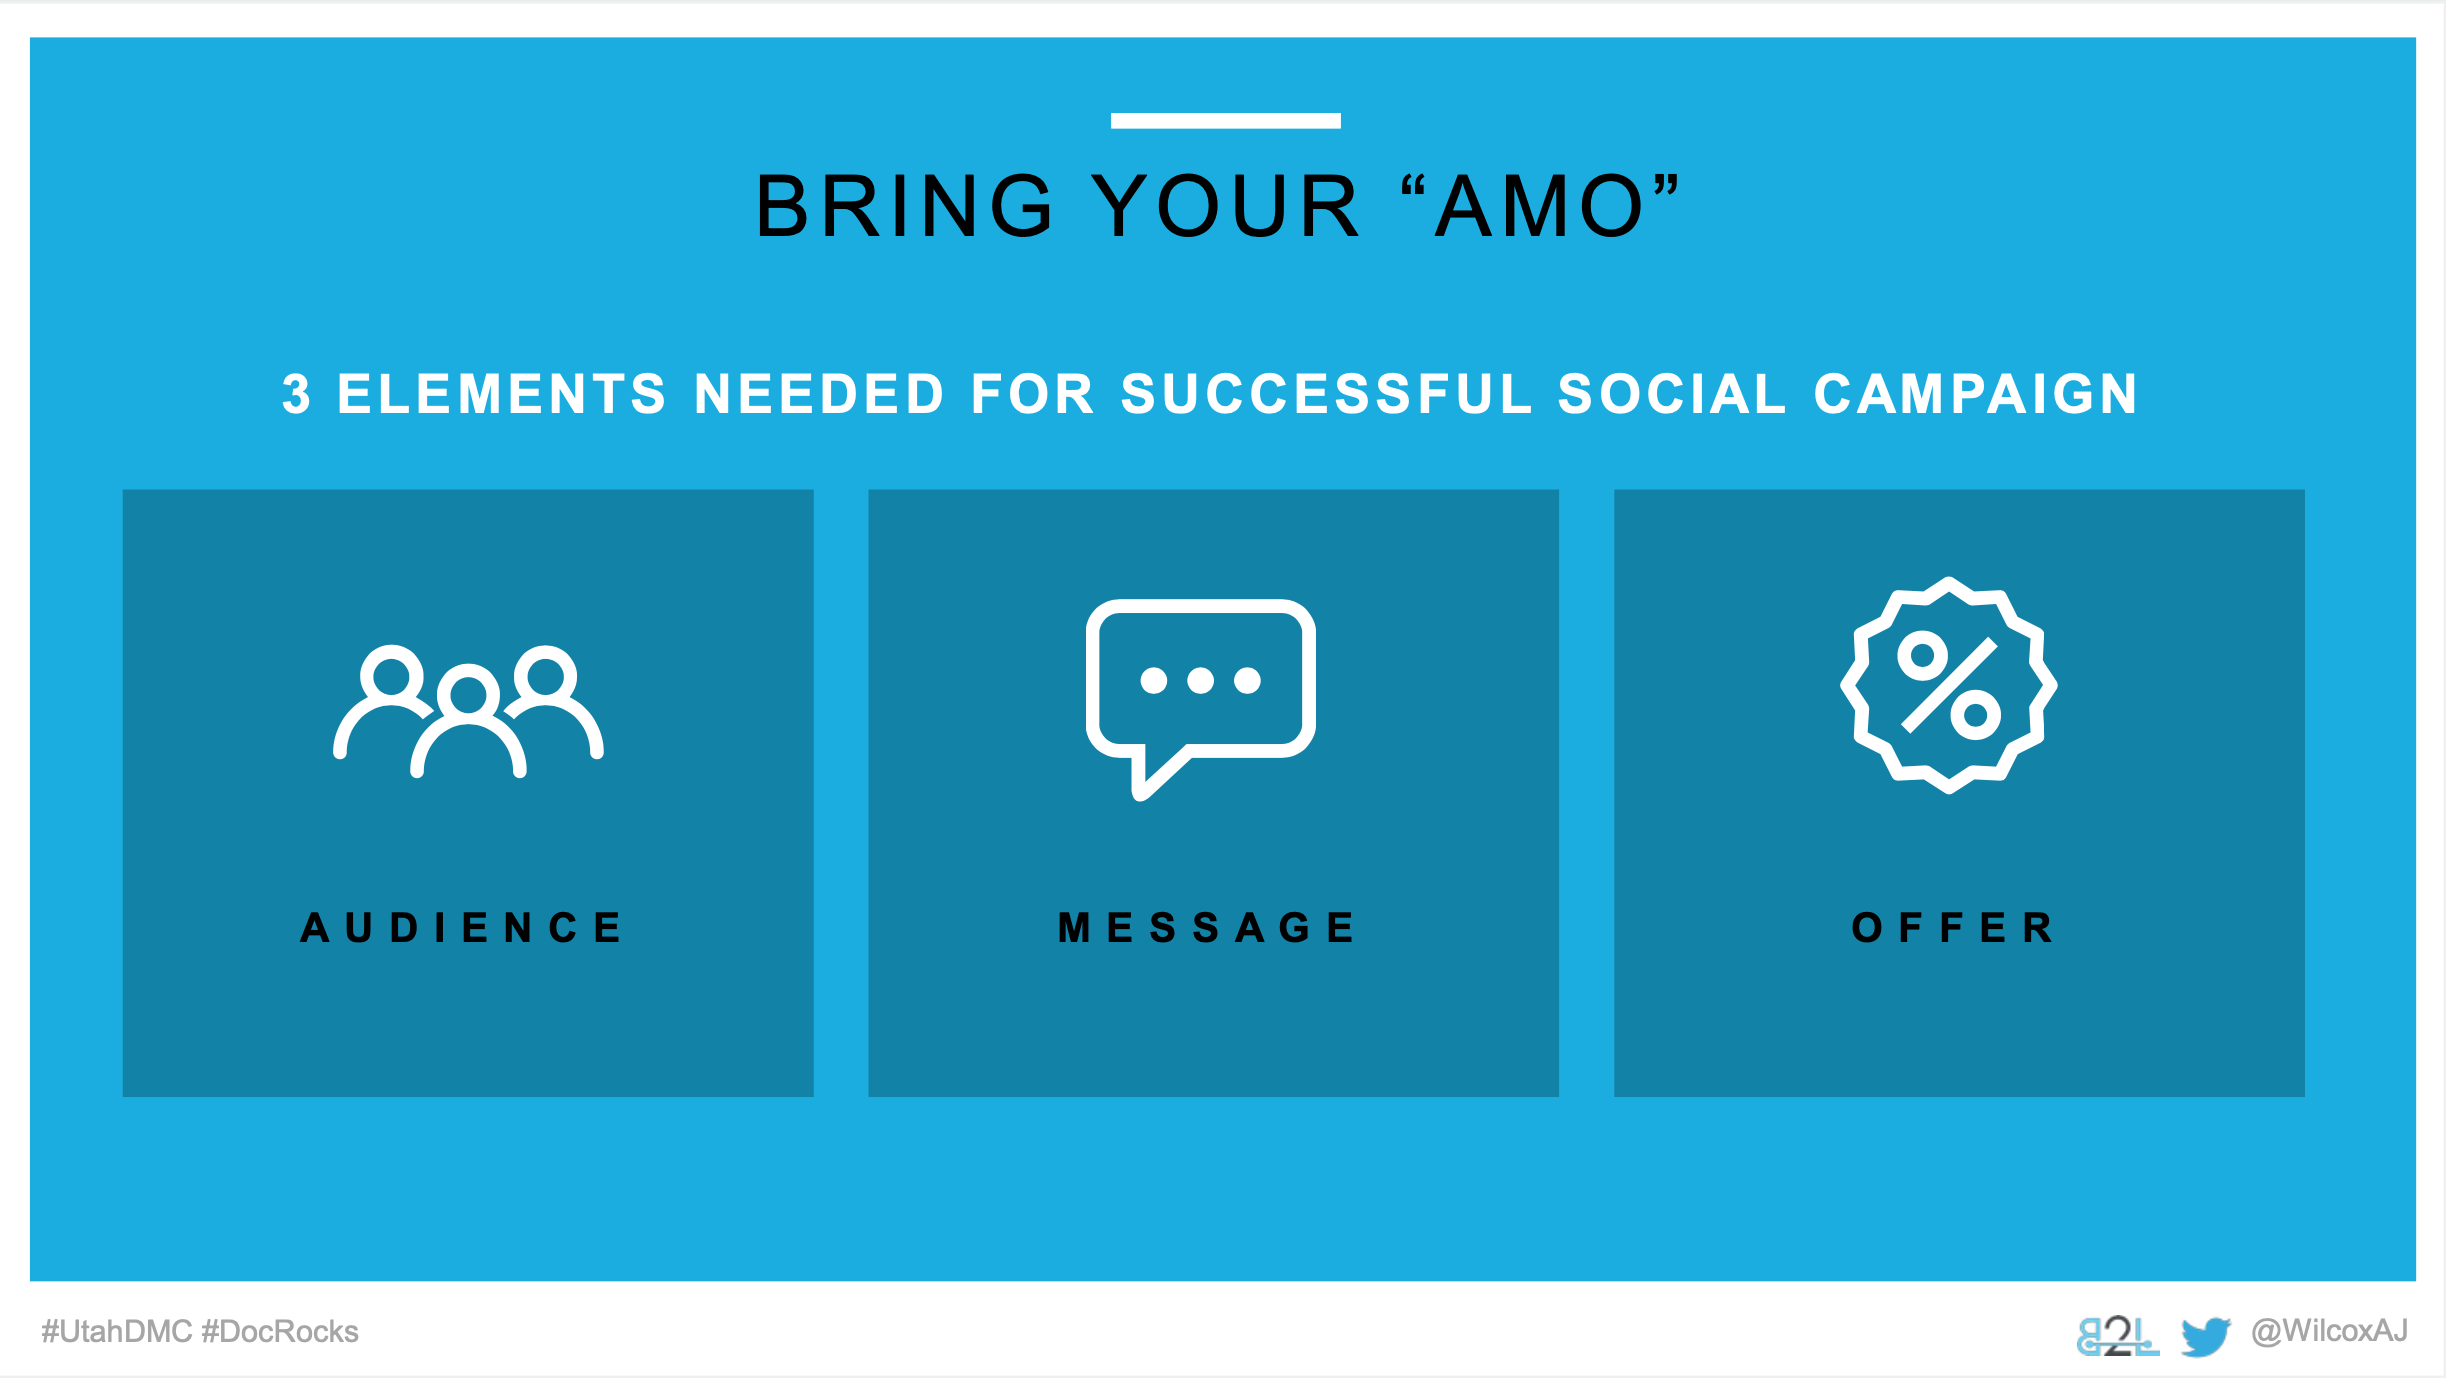 Utah DMC LinkedIn Ads - Aj Wilcox - Bring Your AMO